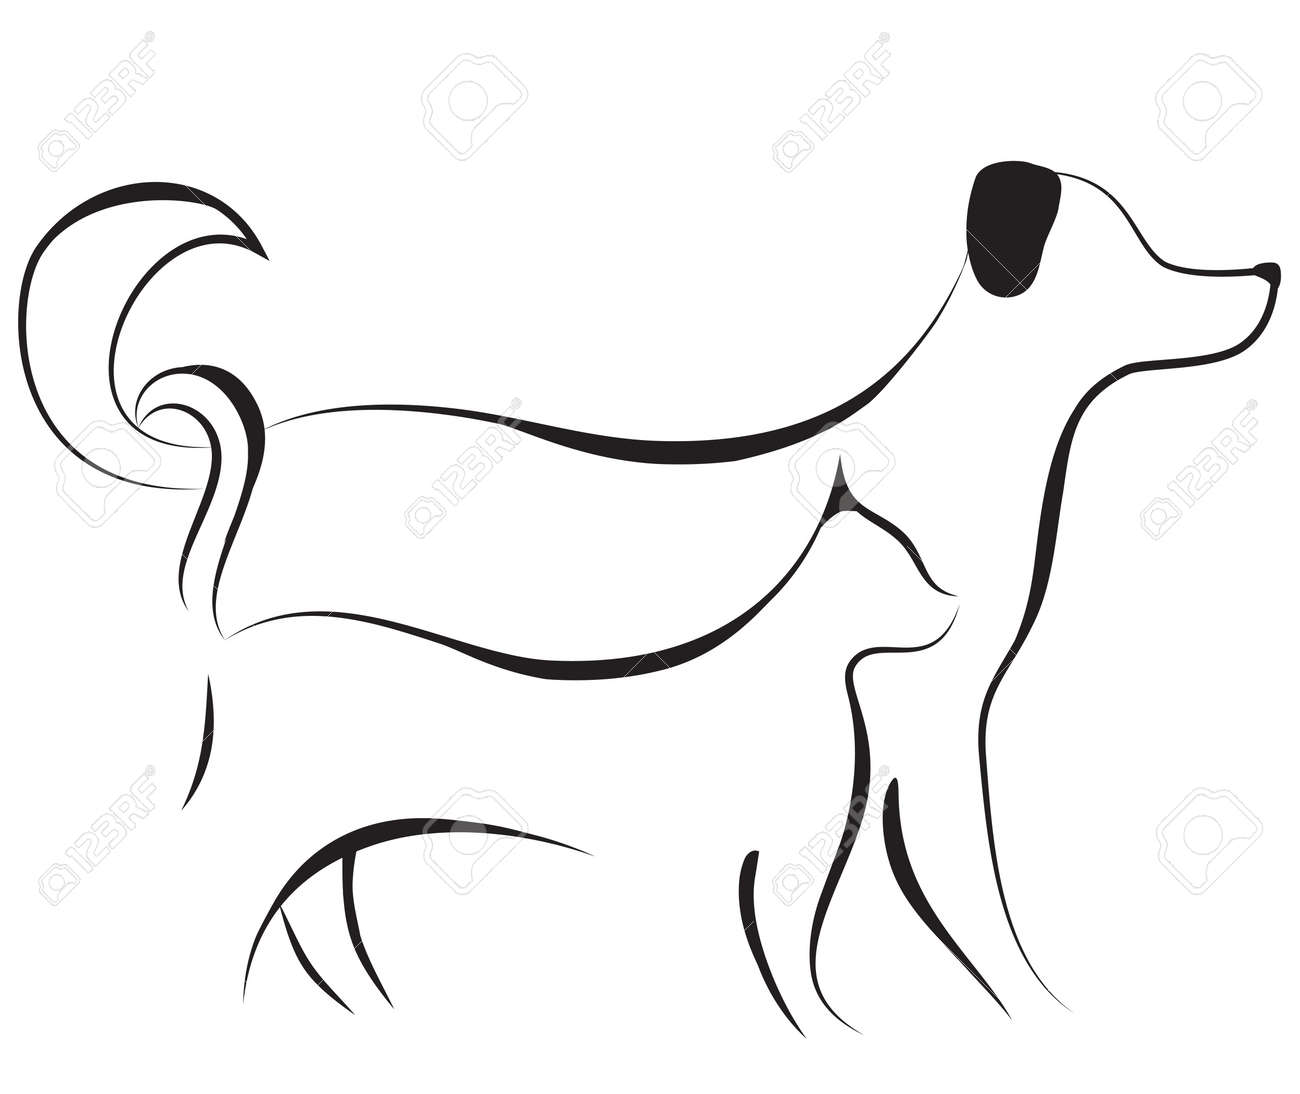 Cat and dog friend logo sketch vector illustration. Element for design. Stock Vector - 11266630